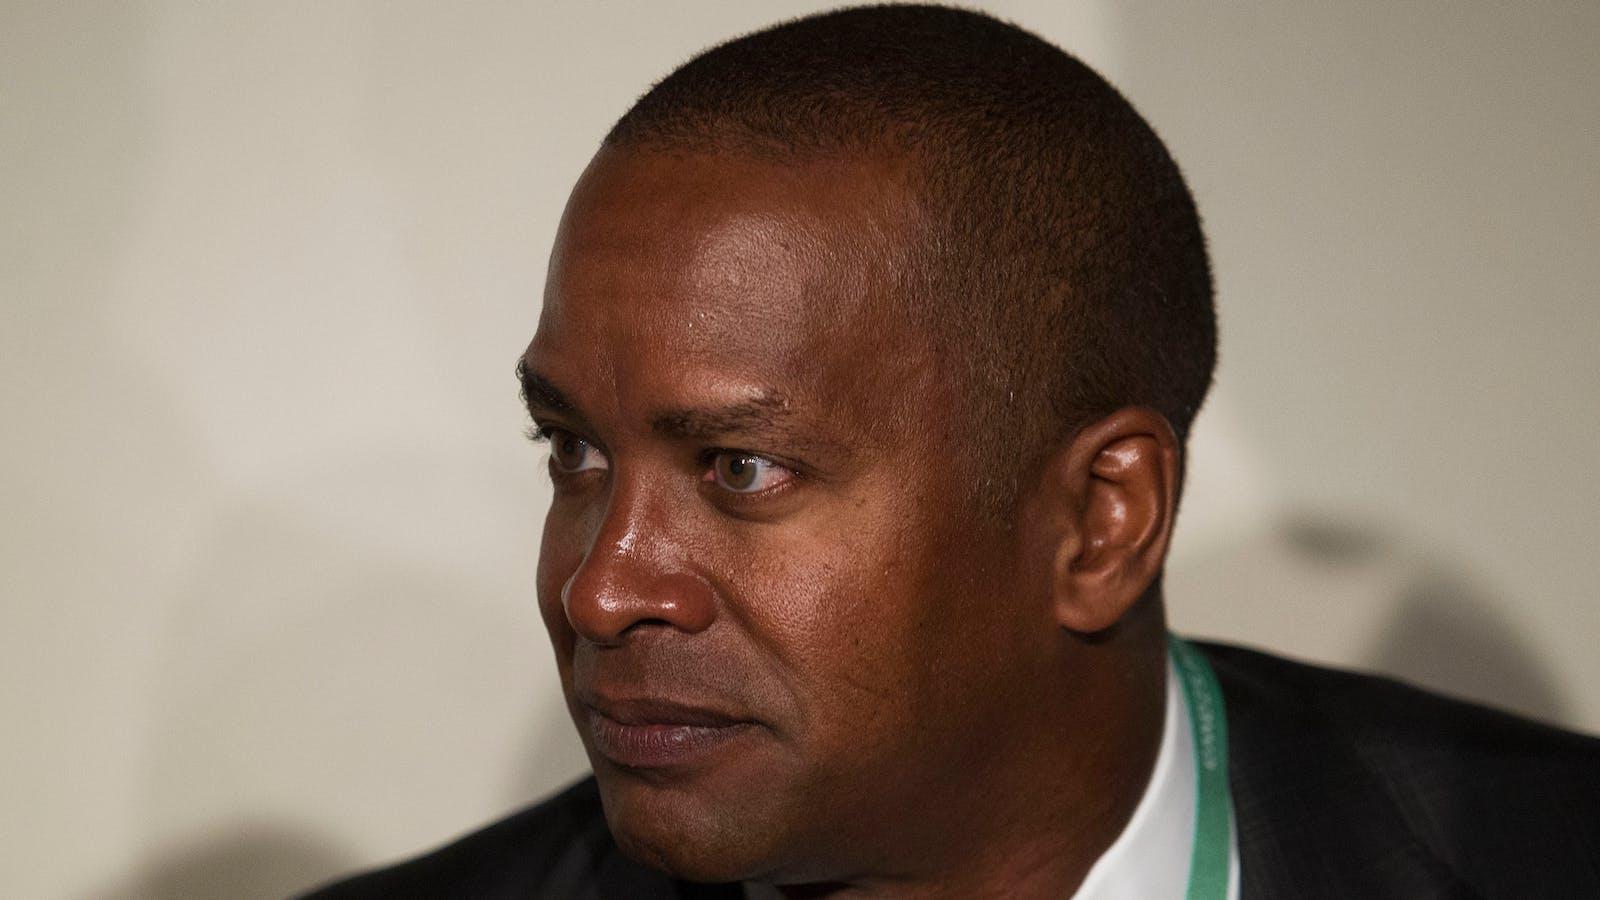 Alphabet's head of corporate development David Drummond. Photo by Bloomberg.